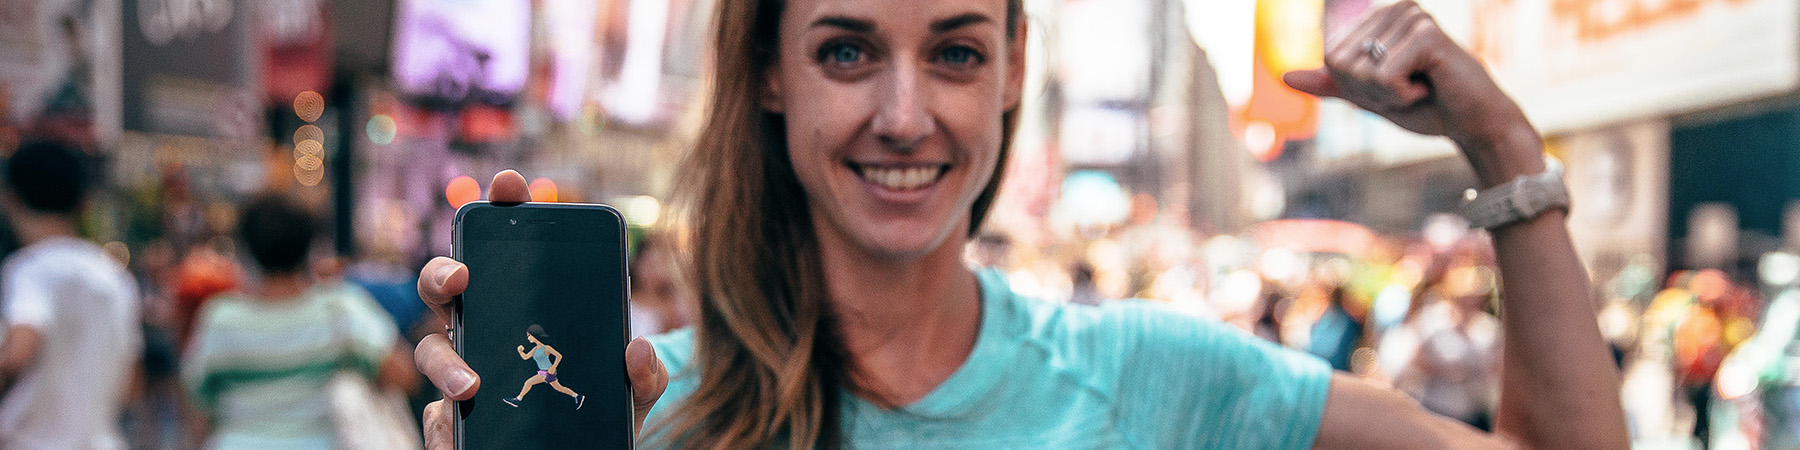 Runner Girl Emoji - Molly Huddle